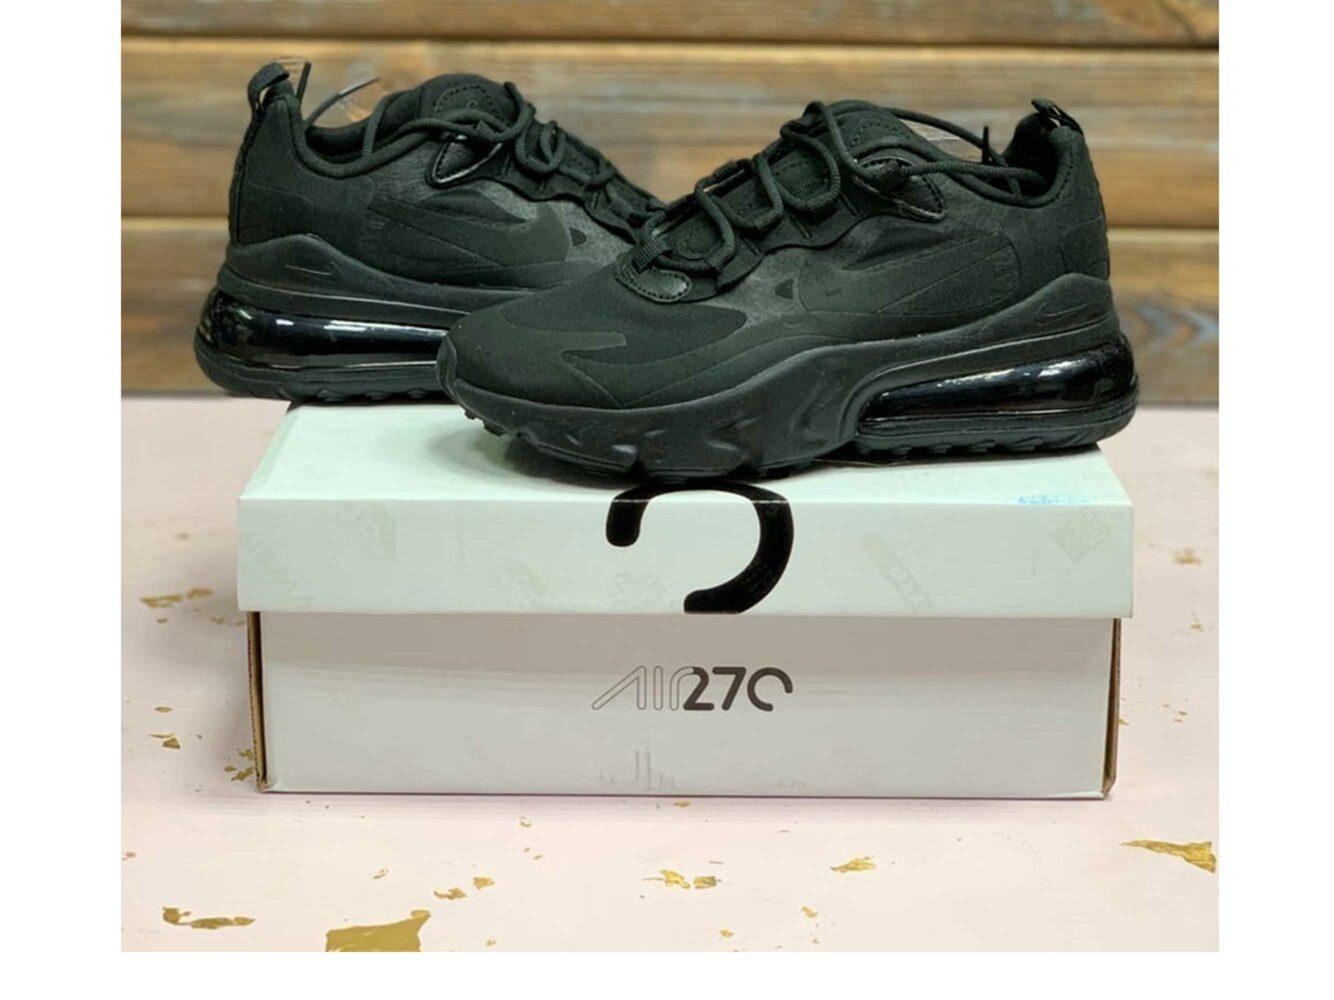 nike air max 270 all black купить